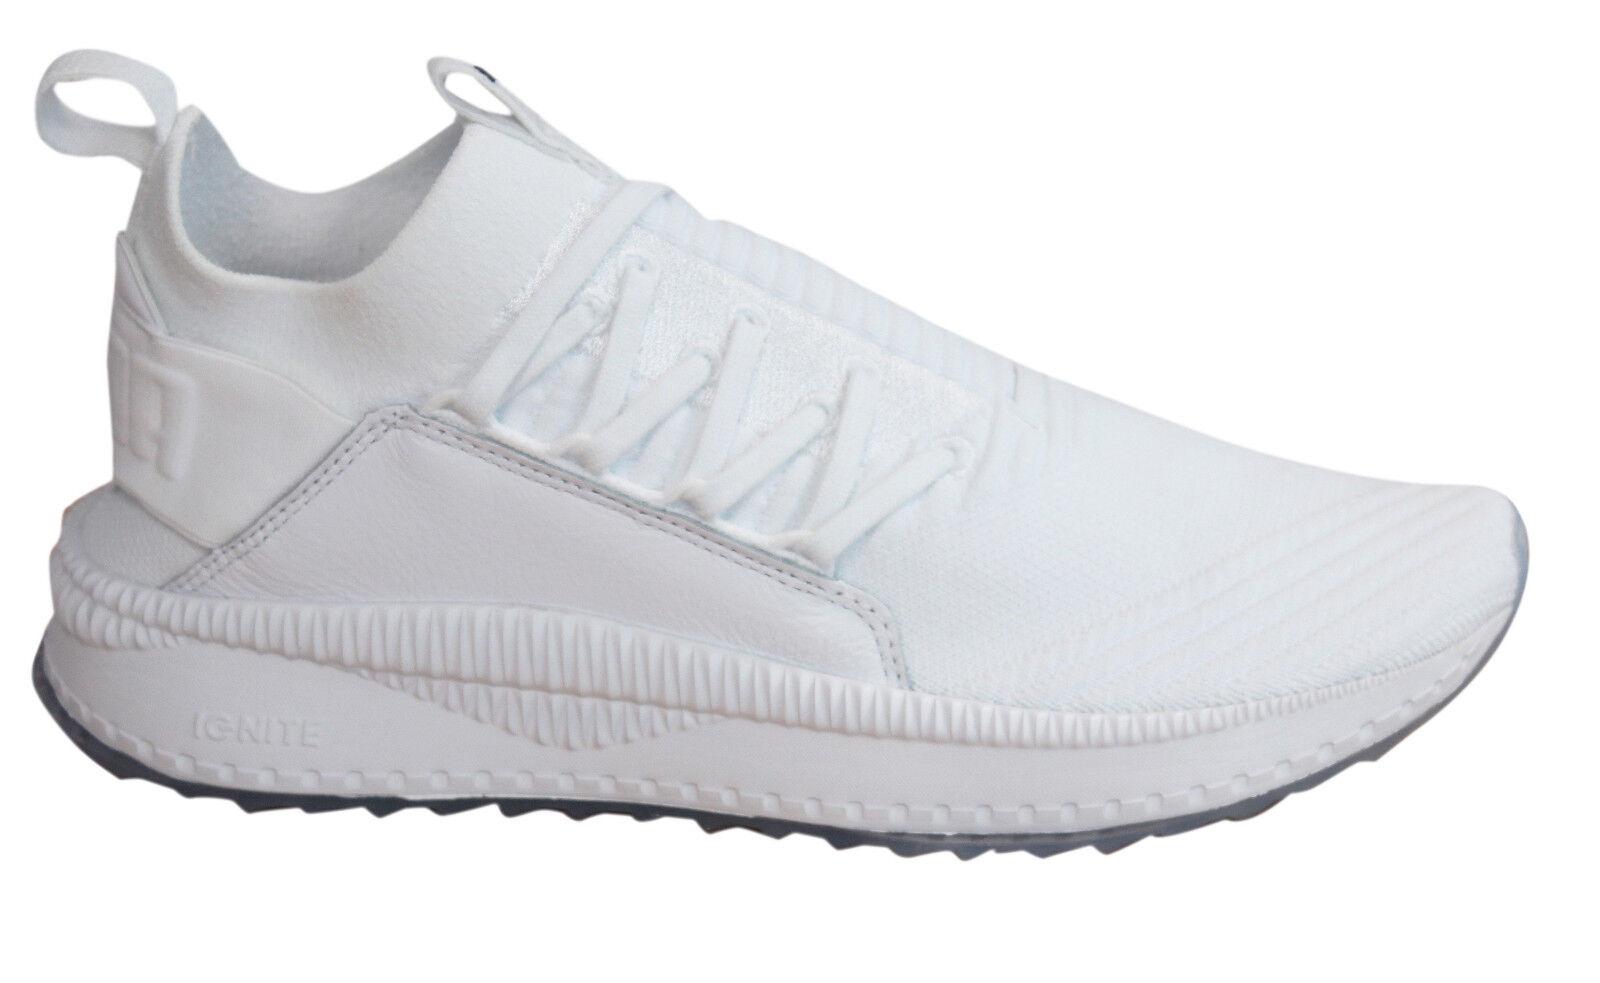 Puma TSUGI Jun Lace Up Blanco Textile Textile Blanco Sock Fit Hombre Trainers Zapatos 365489 02 U55 13d699